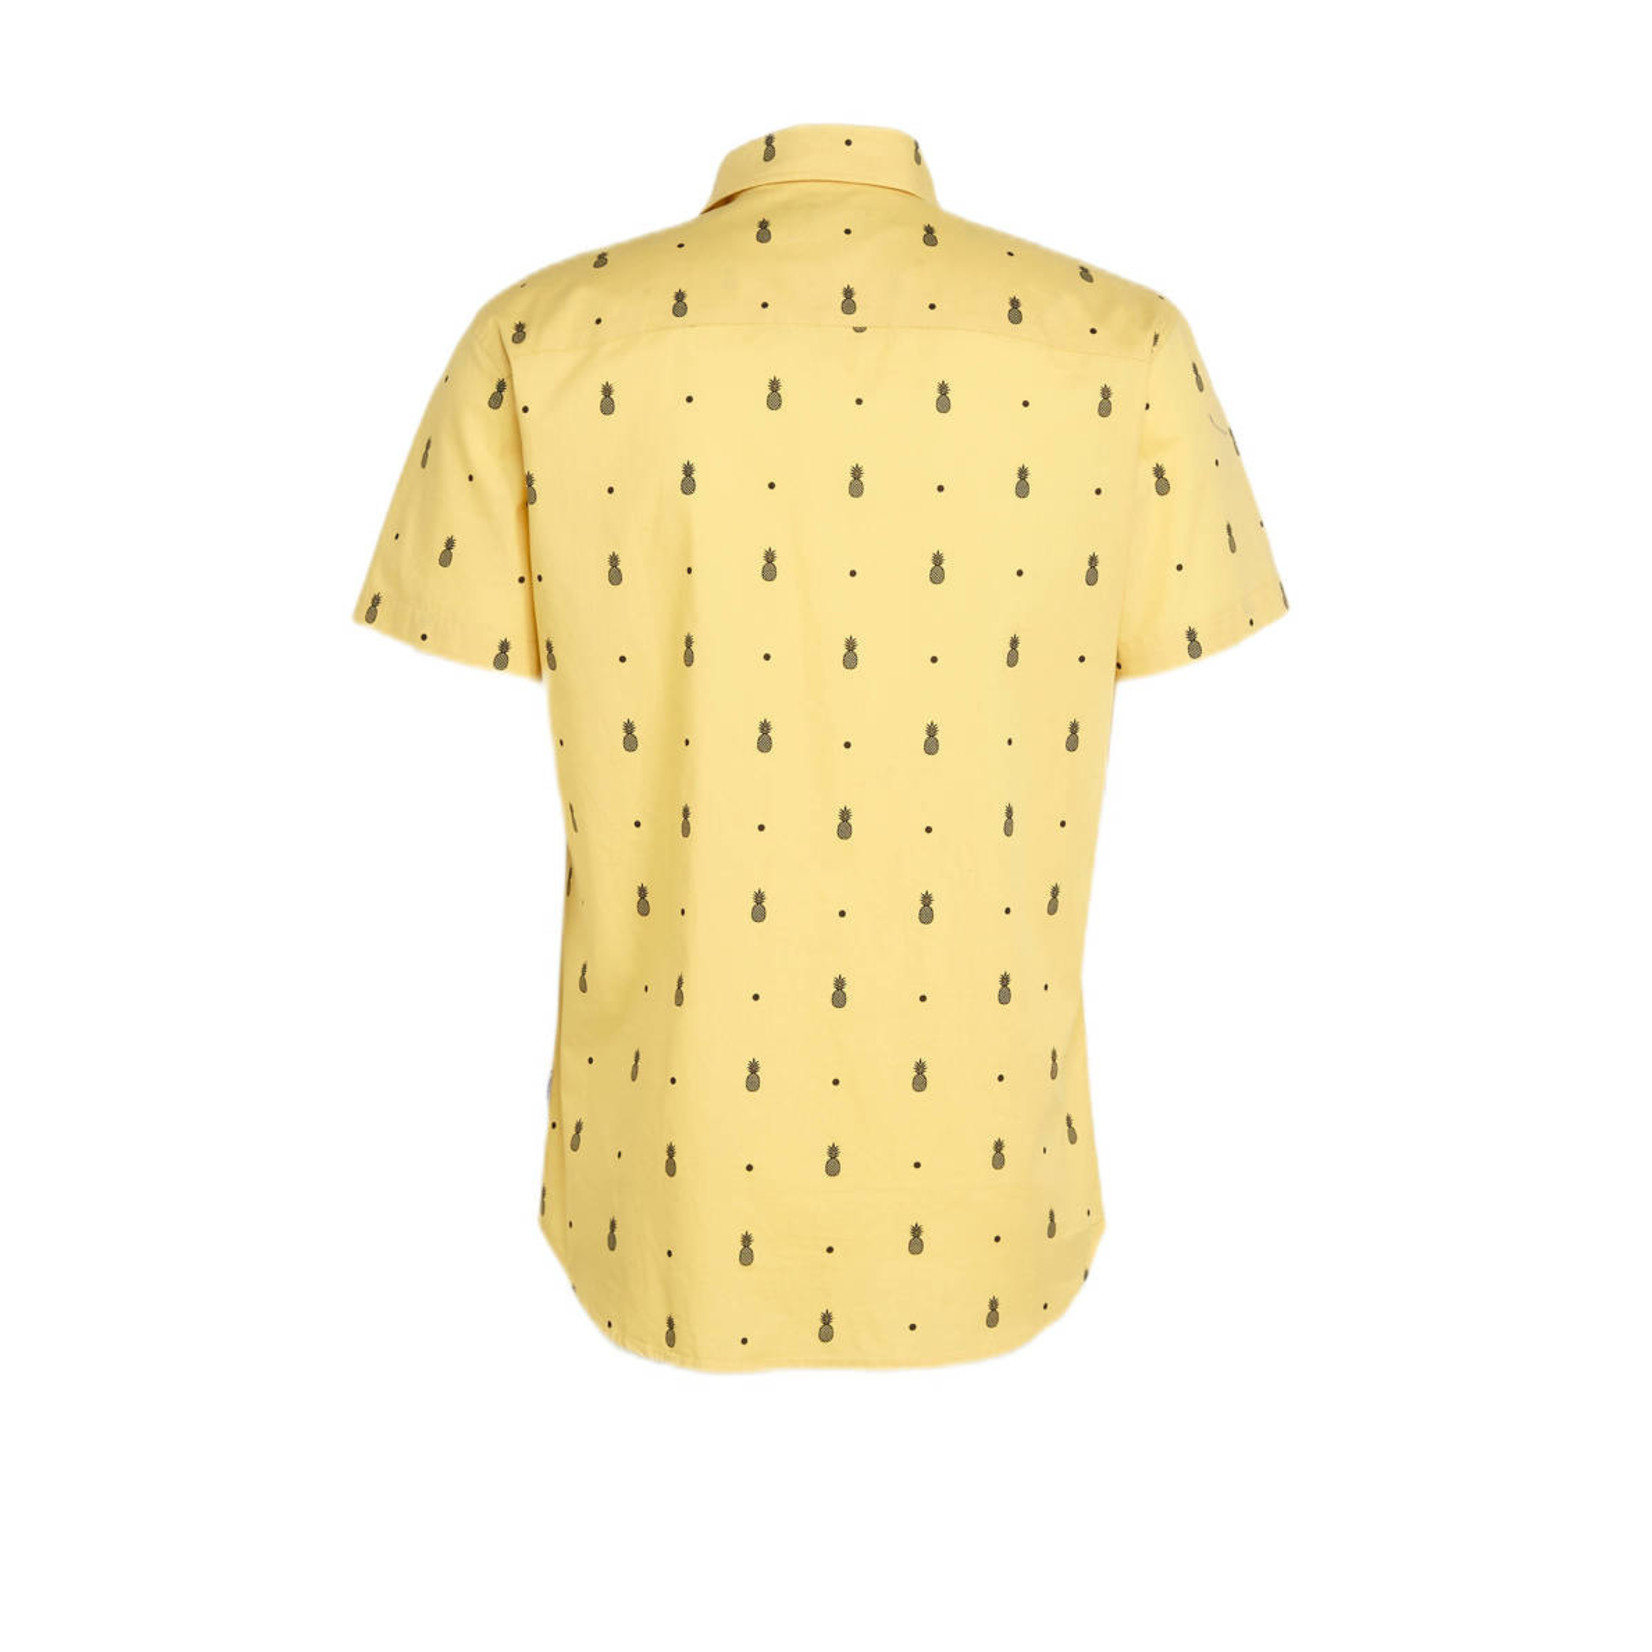 Jack & Jones Jack & Jones 12187951 Poolside Short-Sleeve Shirt - Sahara Sun